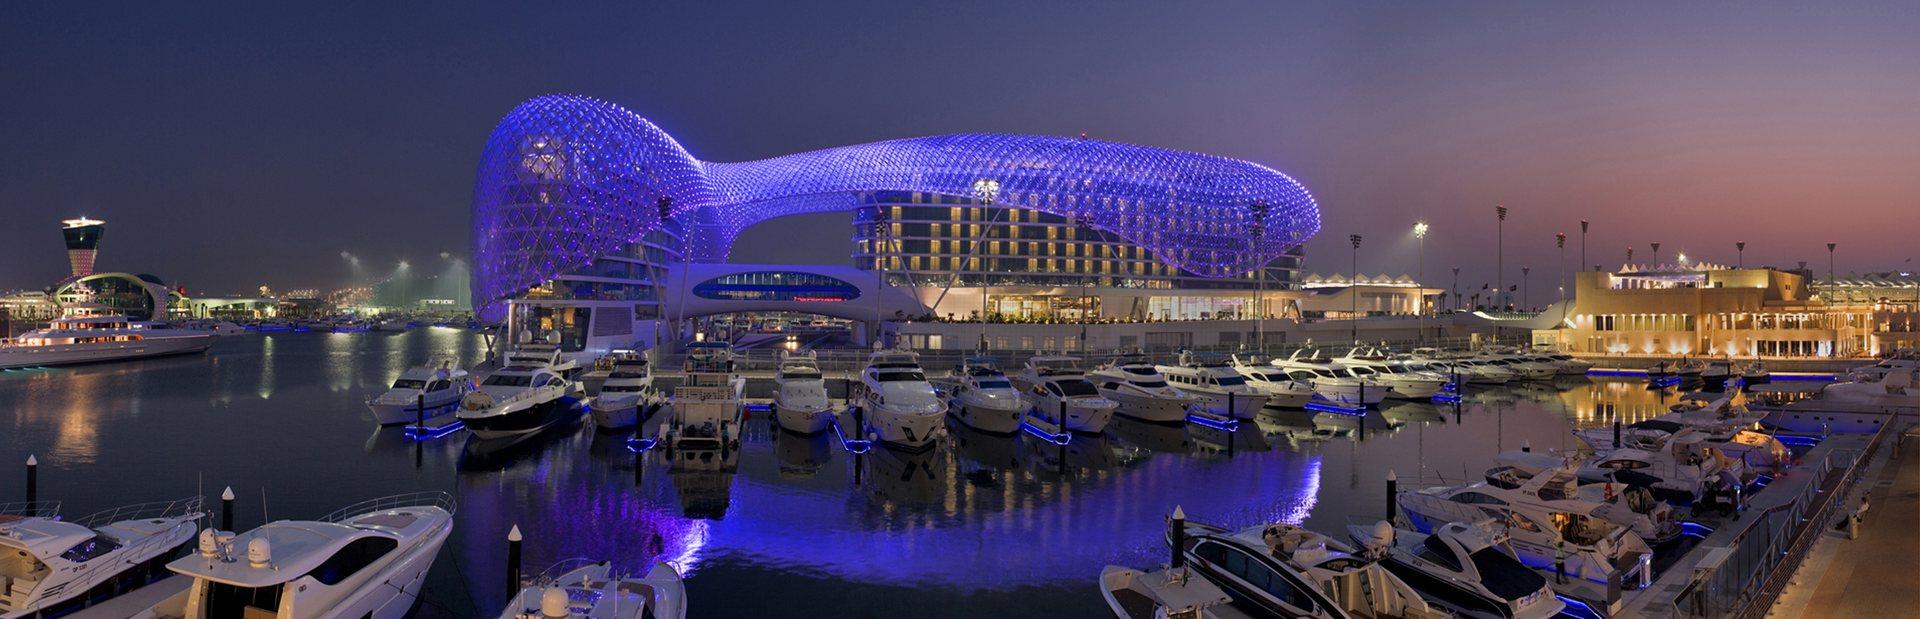 Yas Hotel in Yas Marina Abu Dhabi